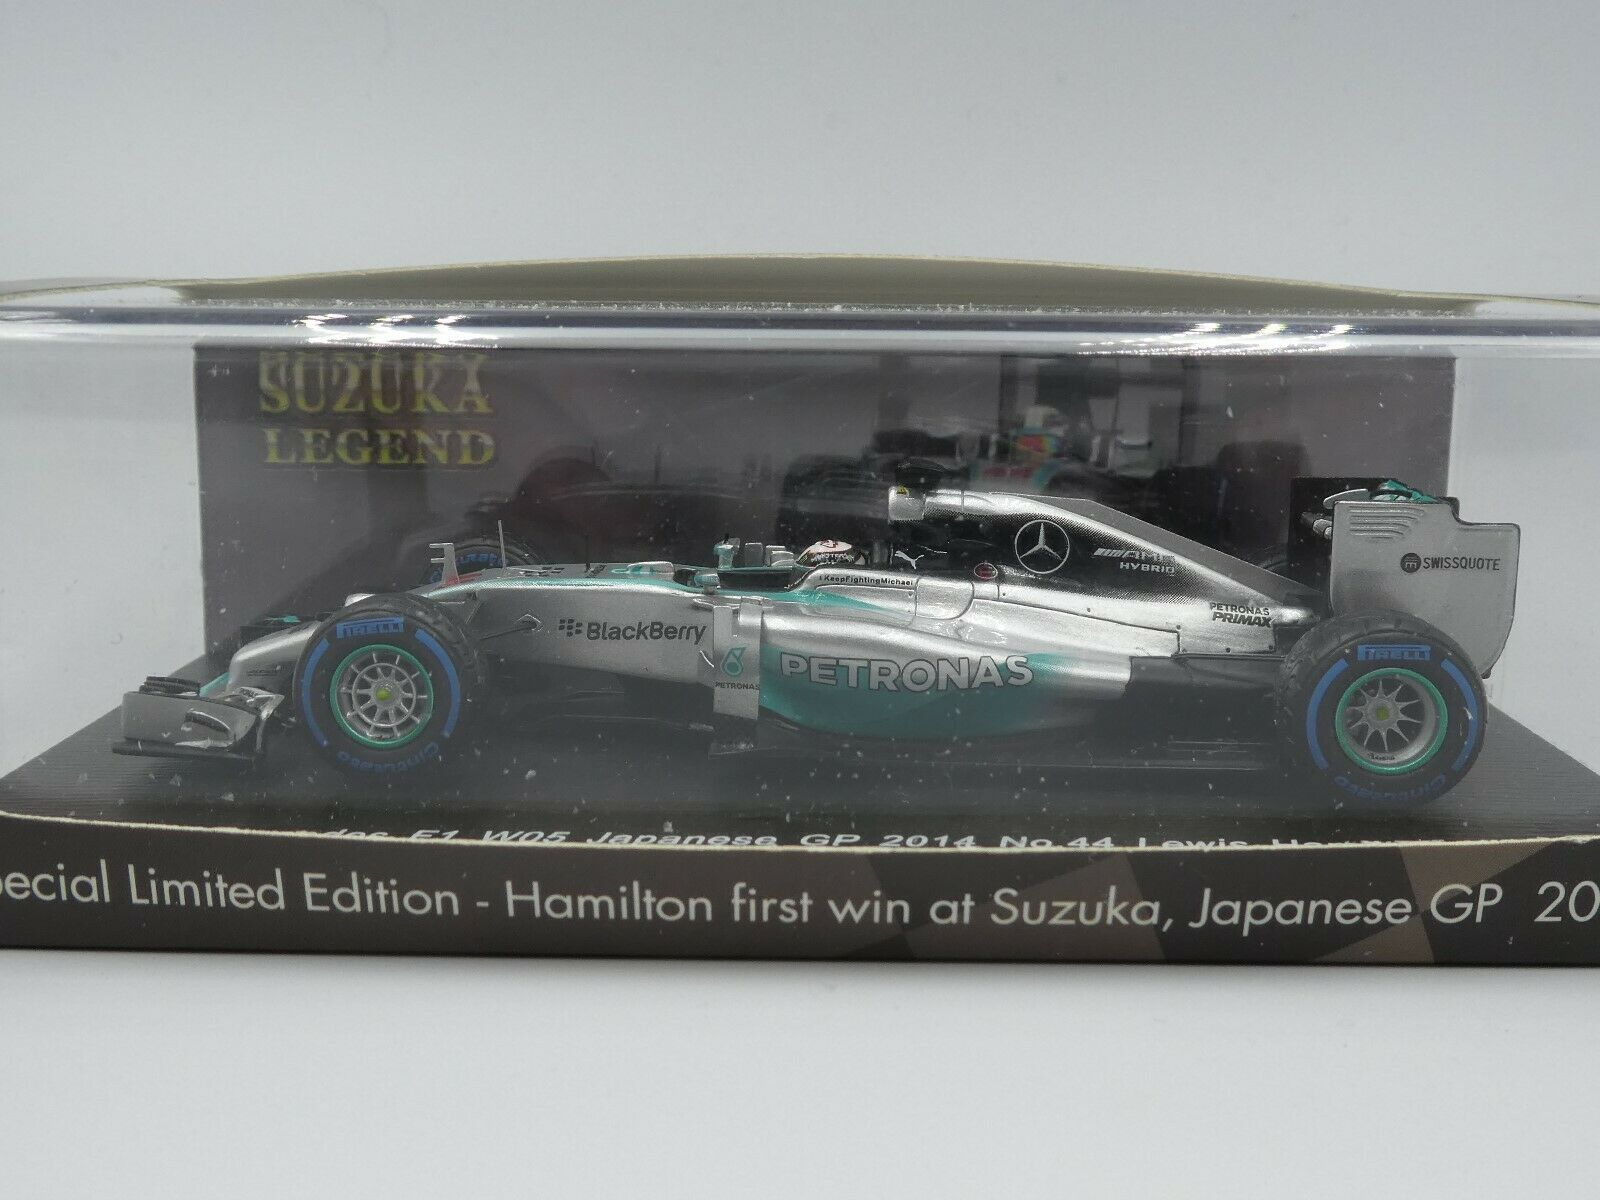 SPARK 1 43 Lewis Hamilton Mercedes W05 Winner Japanese Japanese Japanese GP 2014 SUZUKA LEGEND Box 5cb437